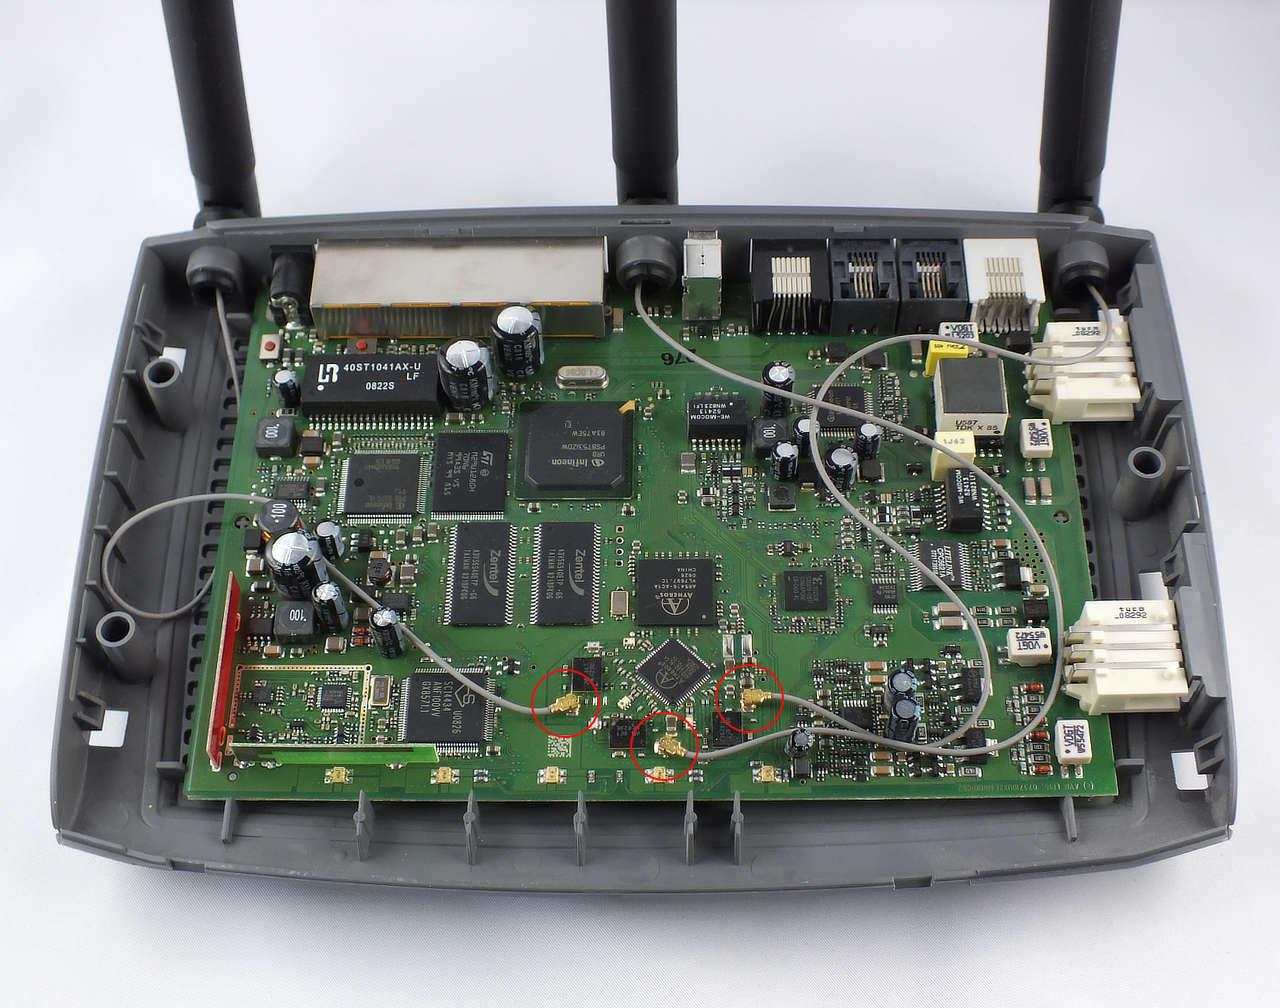 fritz box 7270 anzahl ben tigter antennen frixtender. Black Bedroom Furniture Sets. Home Design Ideas